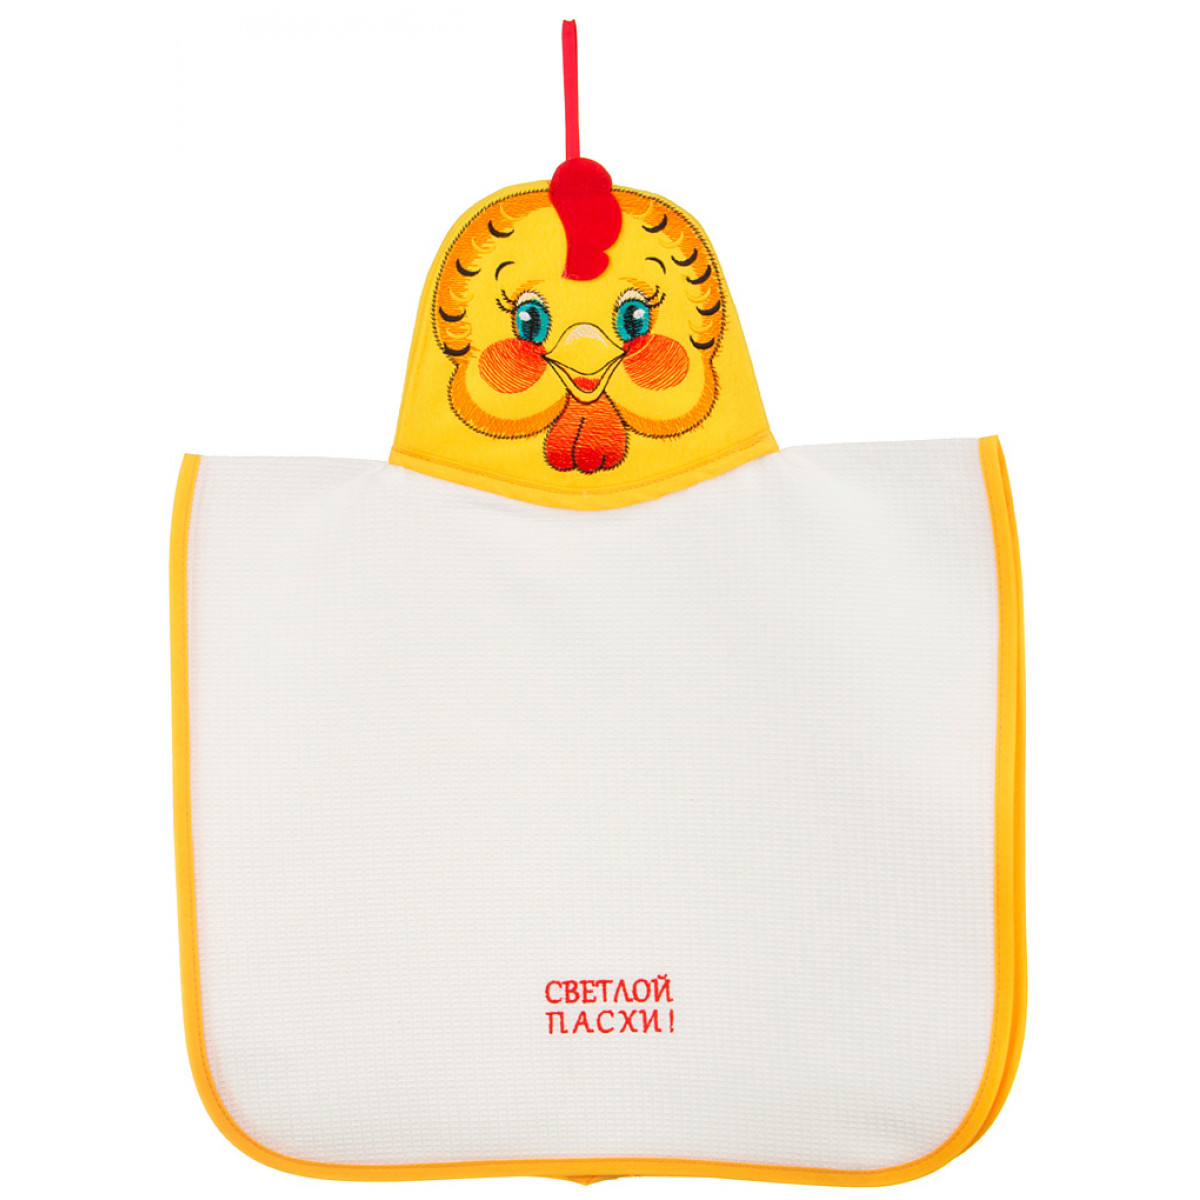 {} Santalino Кухонное полотенце Riley (40х70 см) santalino кухонное полотенце amey круглая 70 см